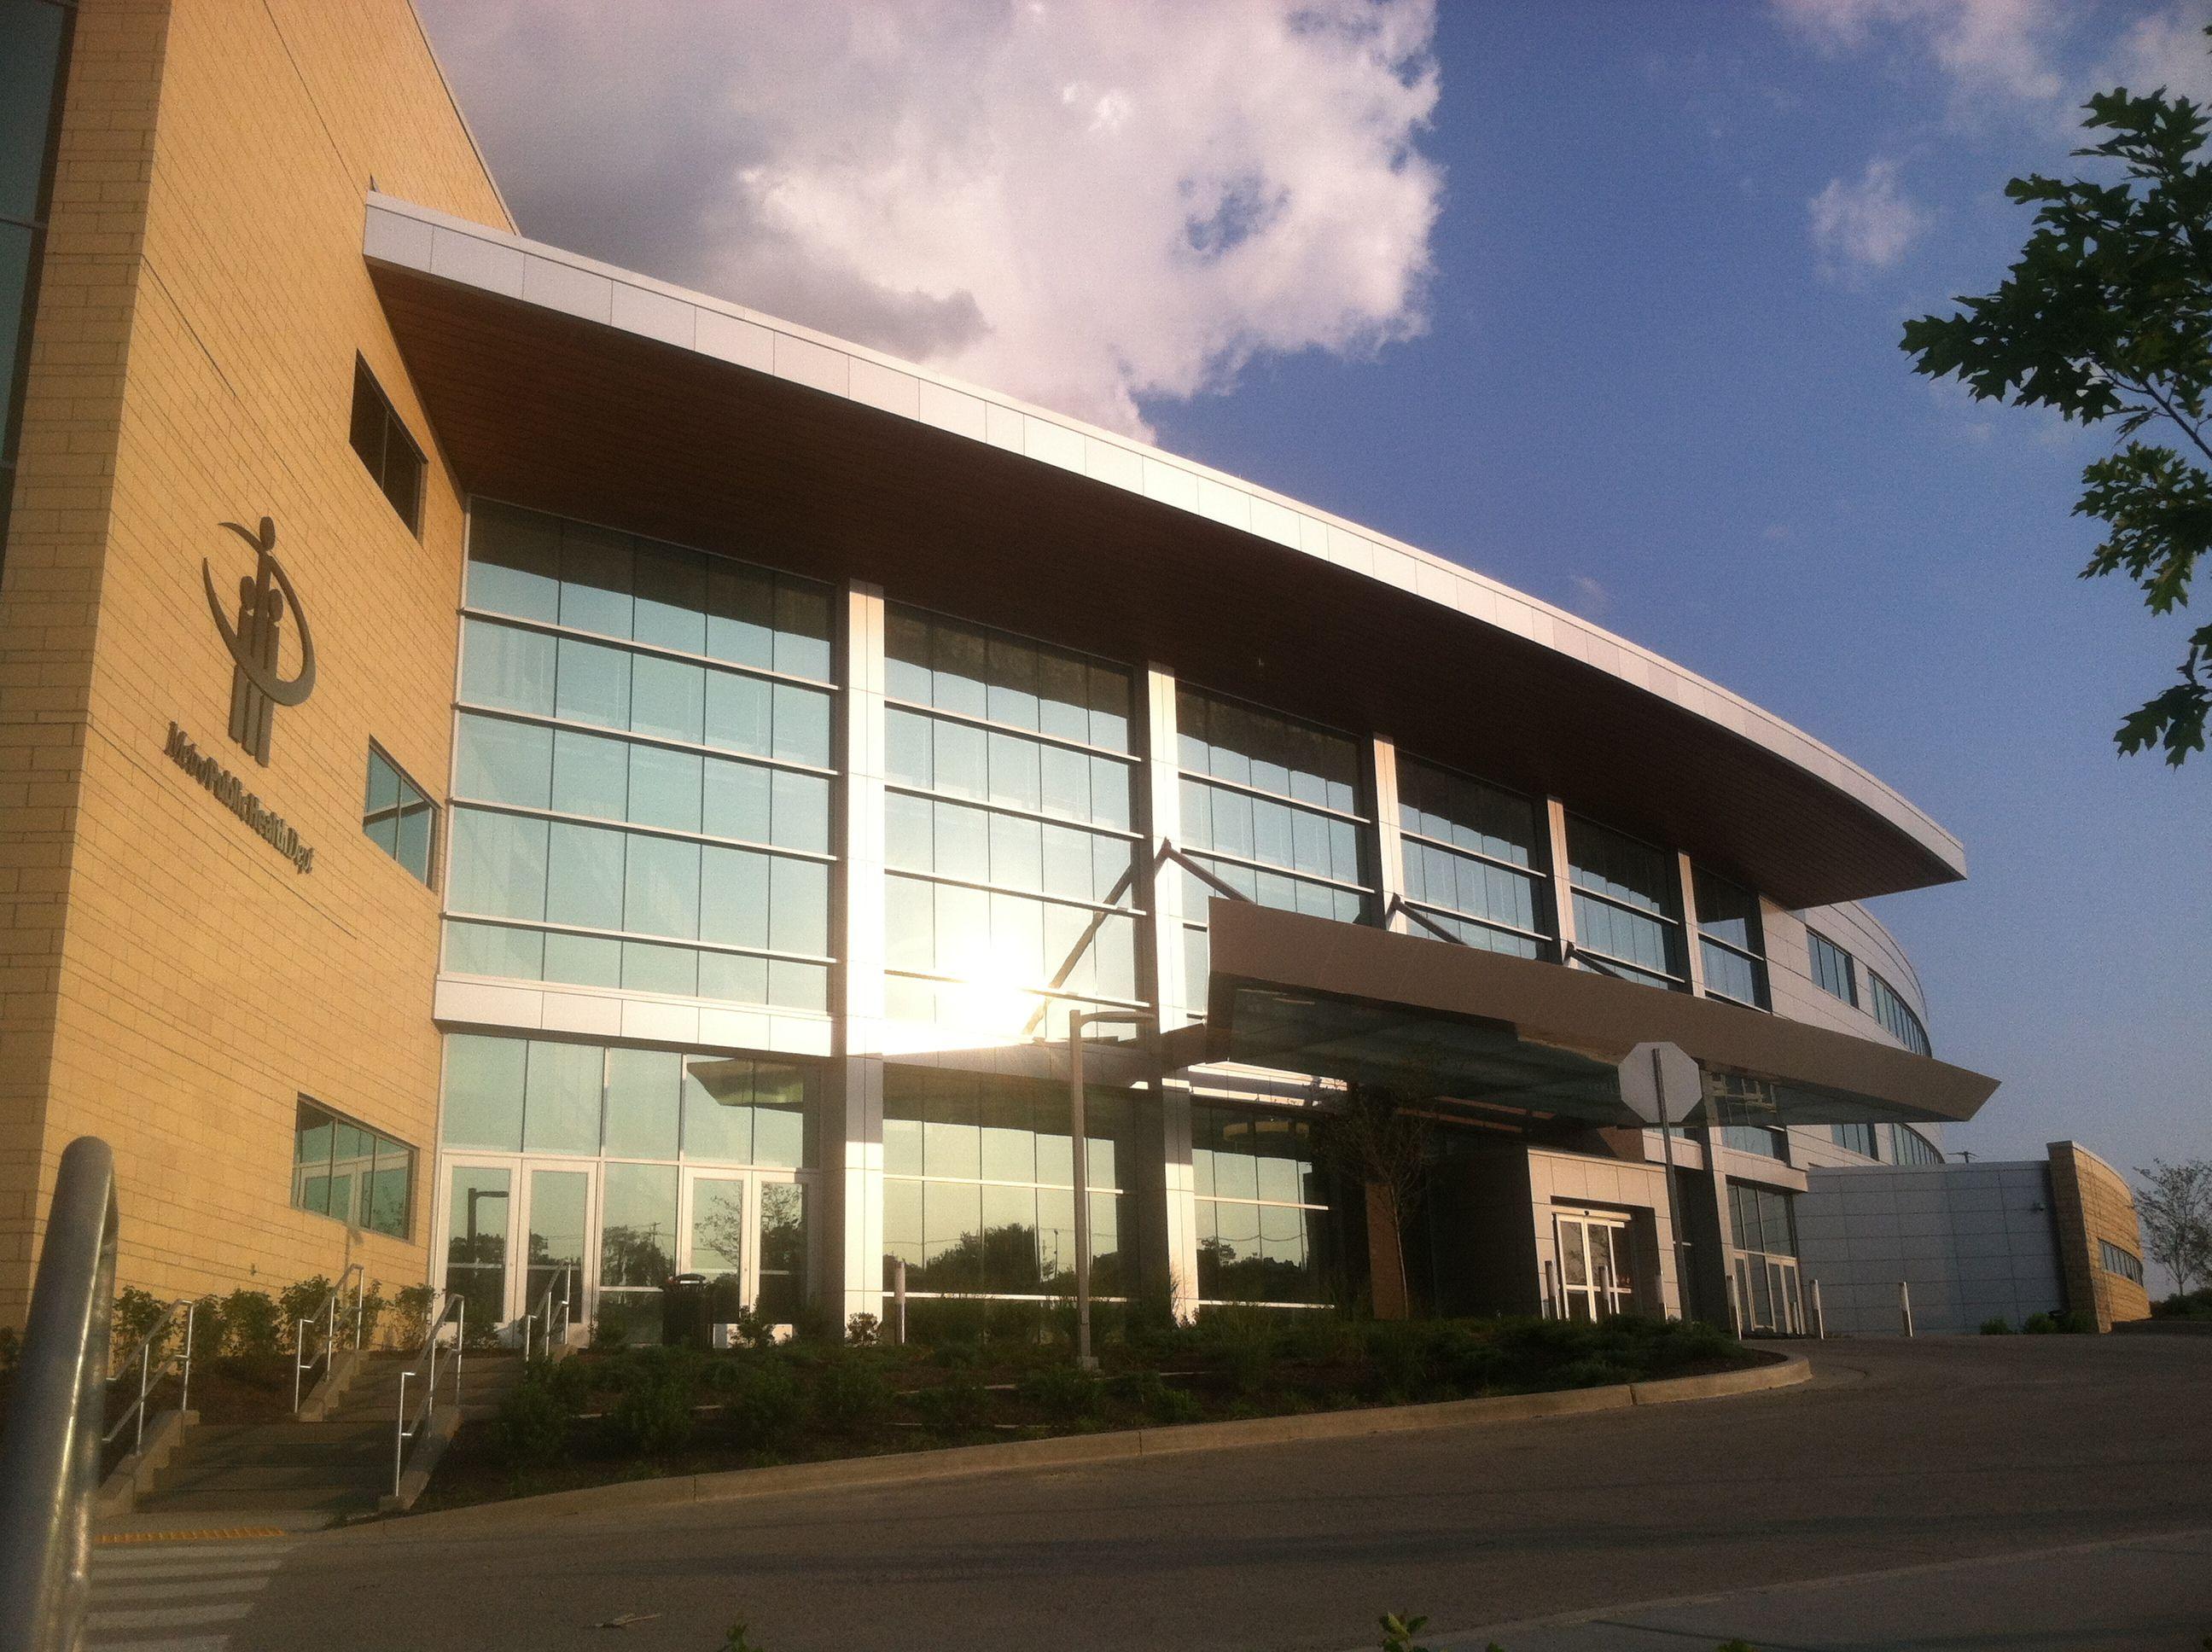 Lentz Public Health Center Health Center Public Health Public